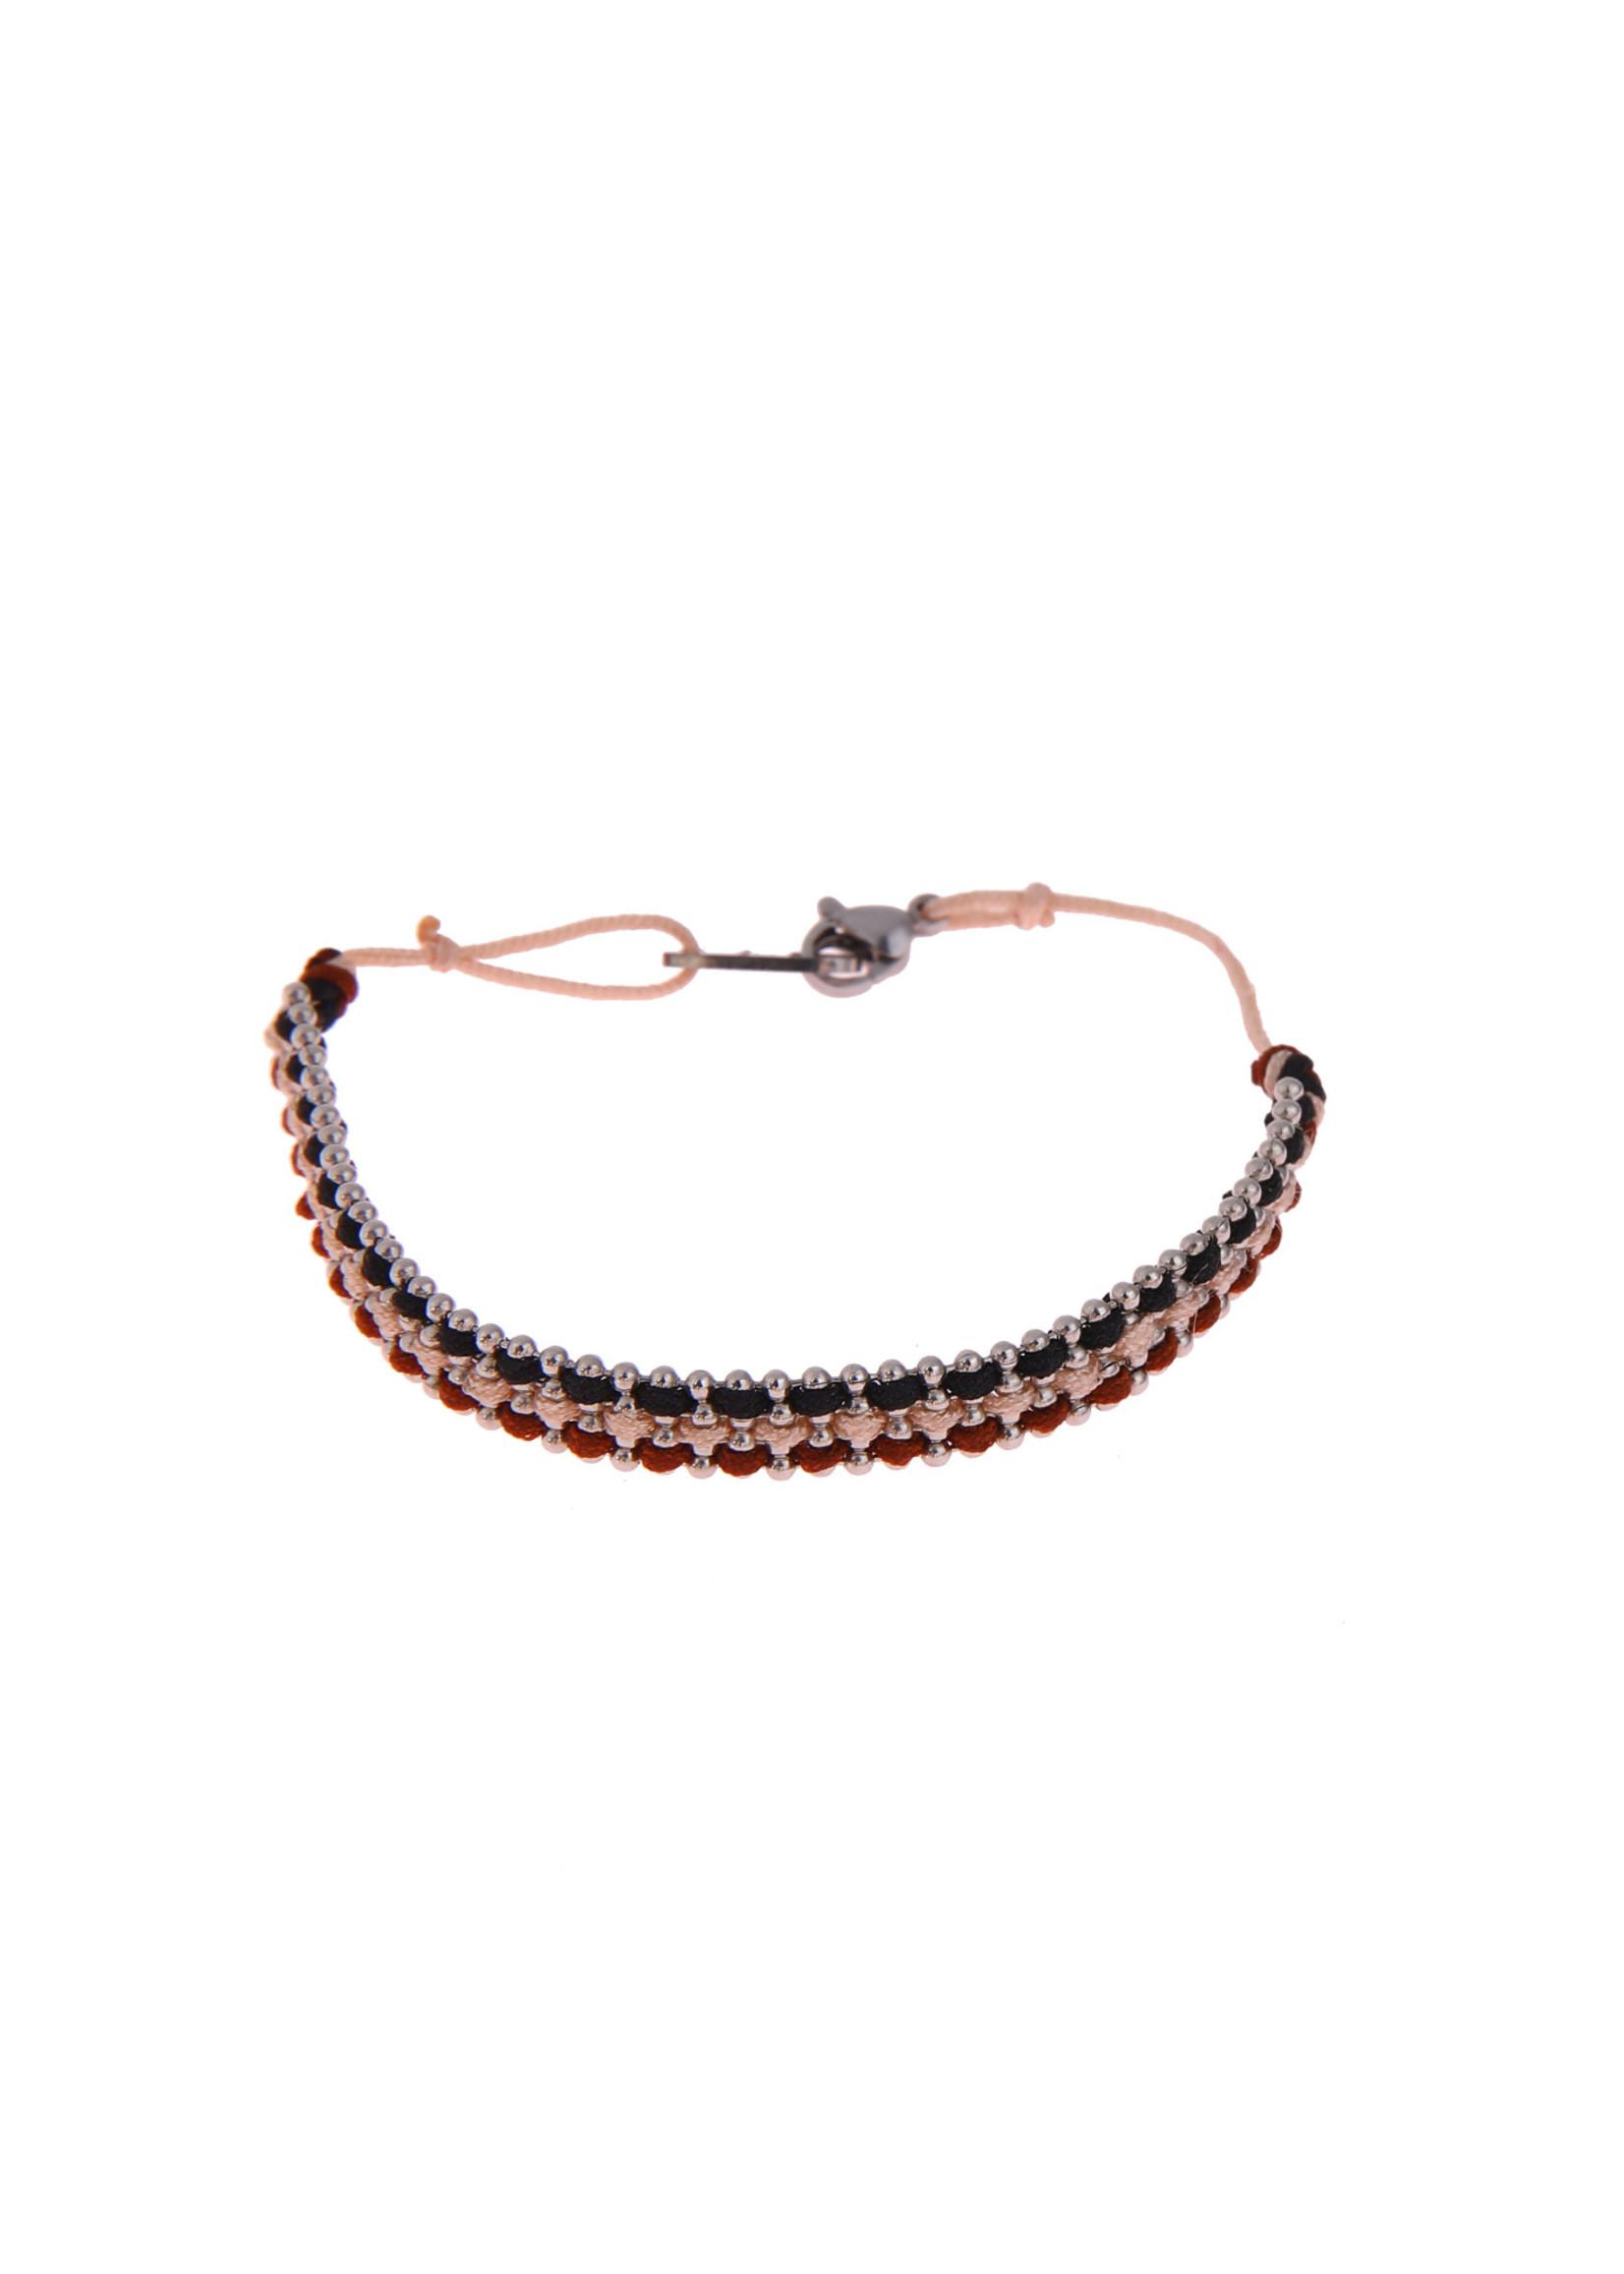 Armband zilver/ blauw/ roze/ rood B0552-4